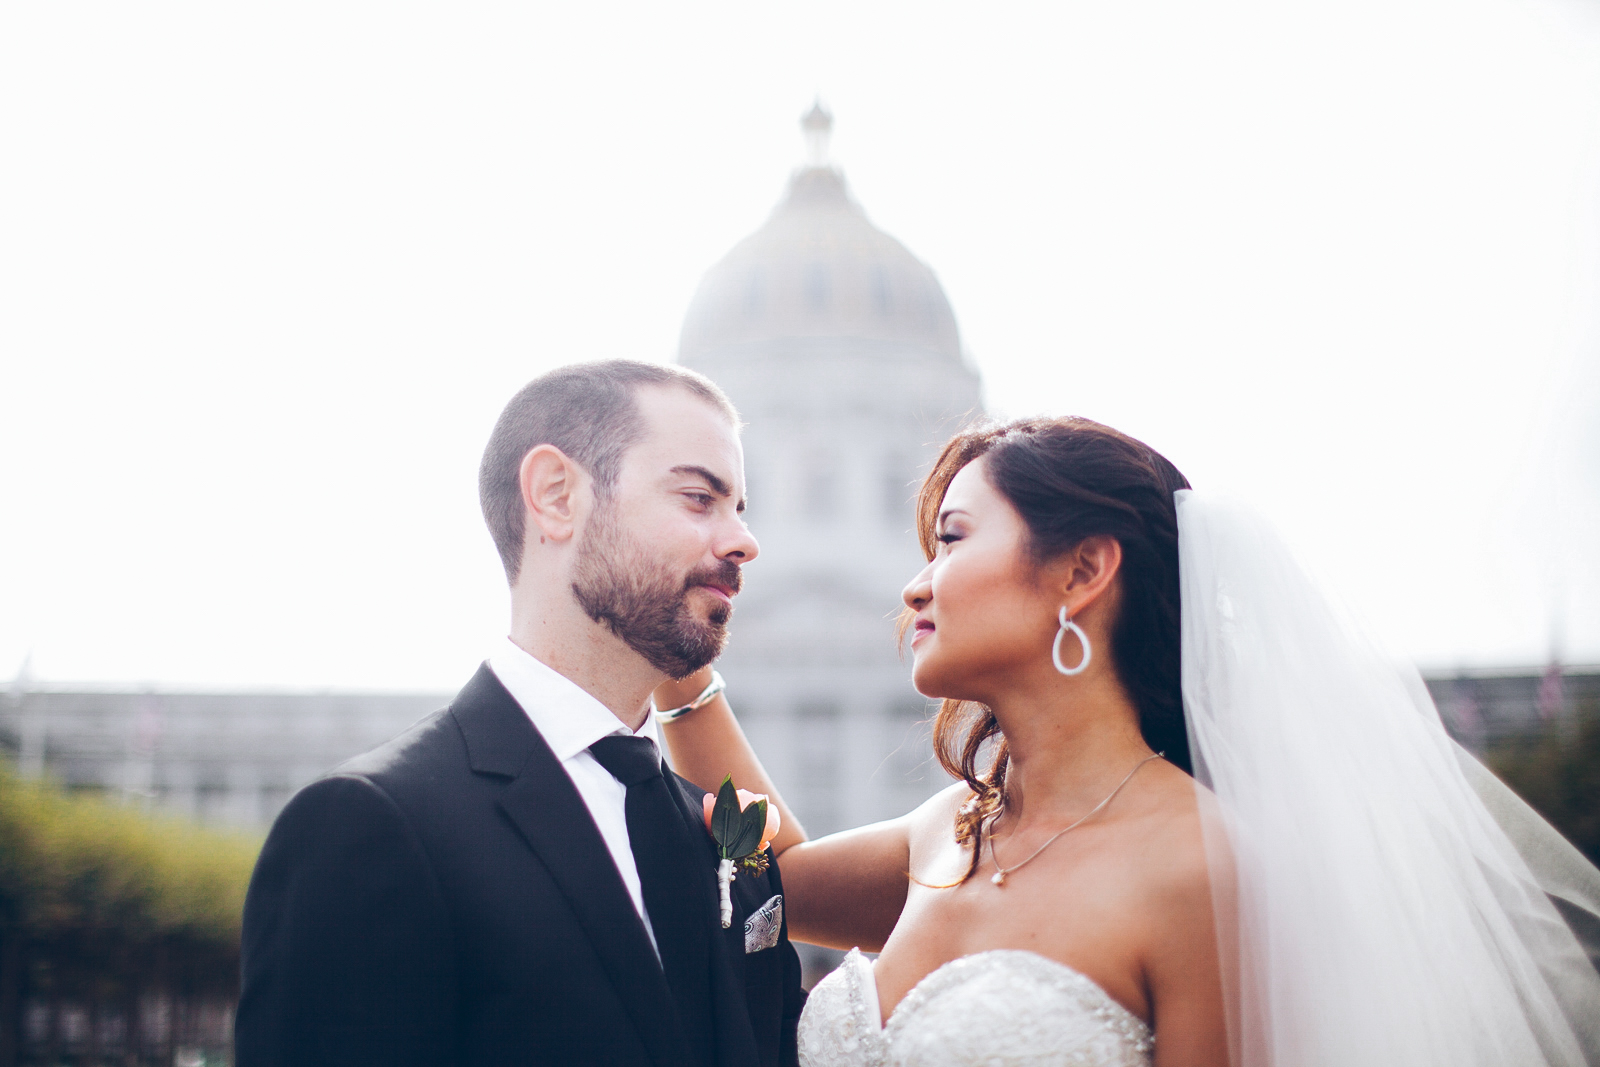 San_francisco_city_hall_wedding_photography_meegan_travis_ebony_siovhan_bokeh_photography_65.jpg